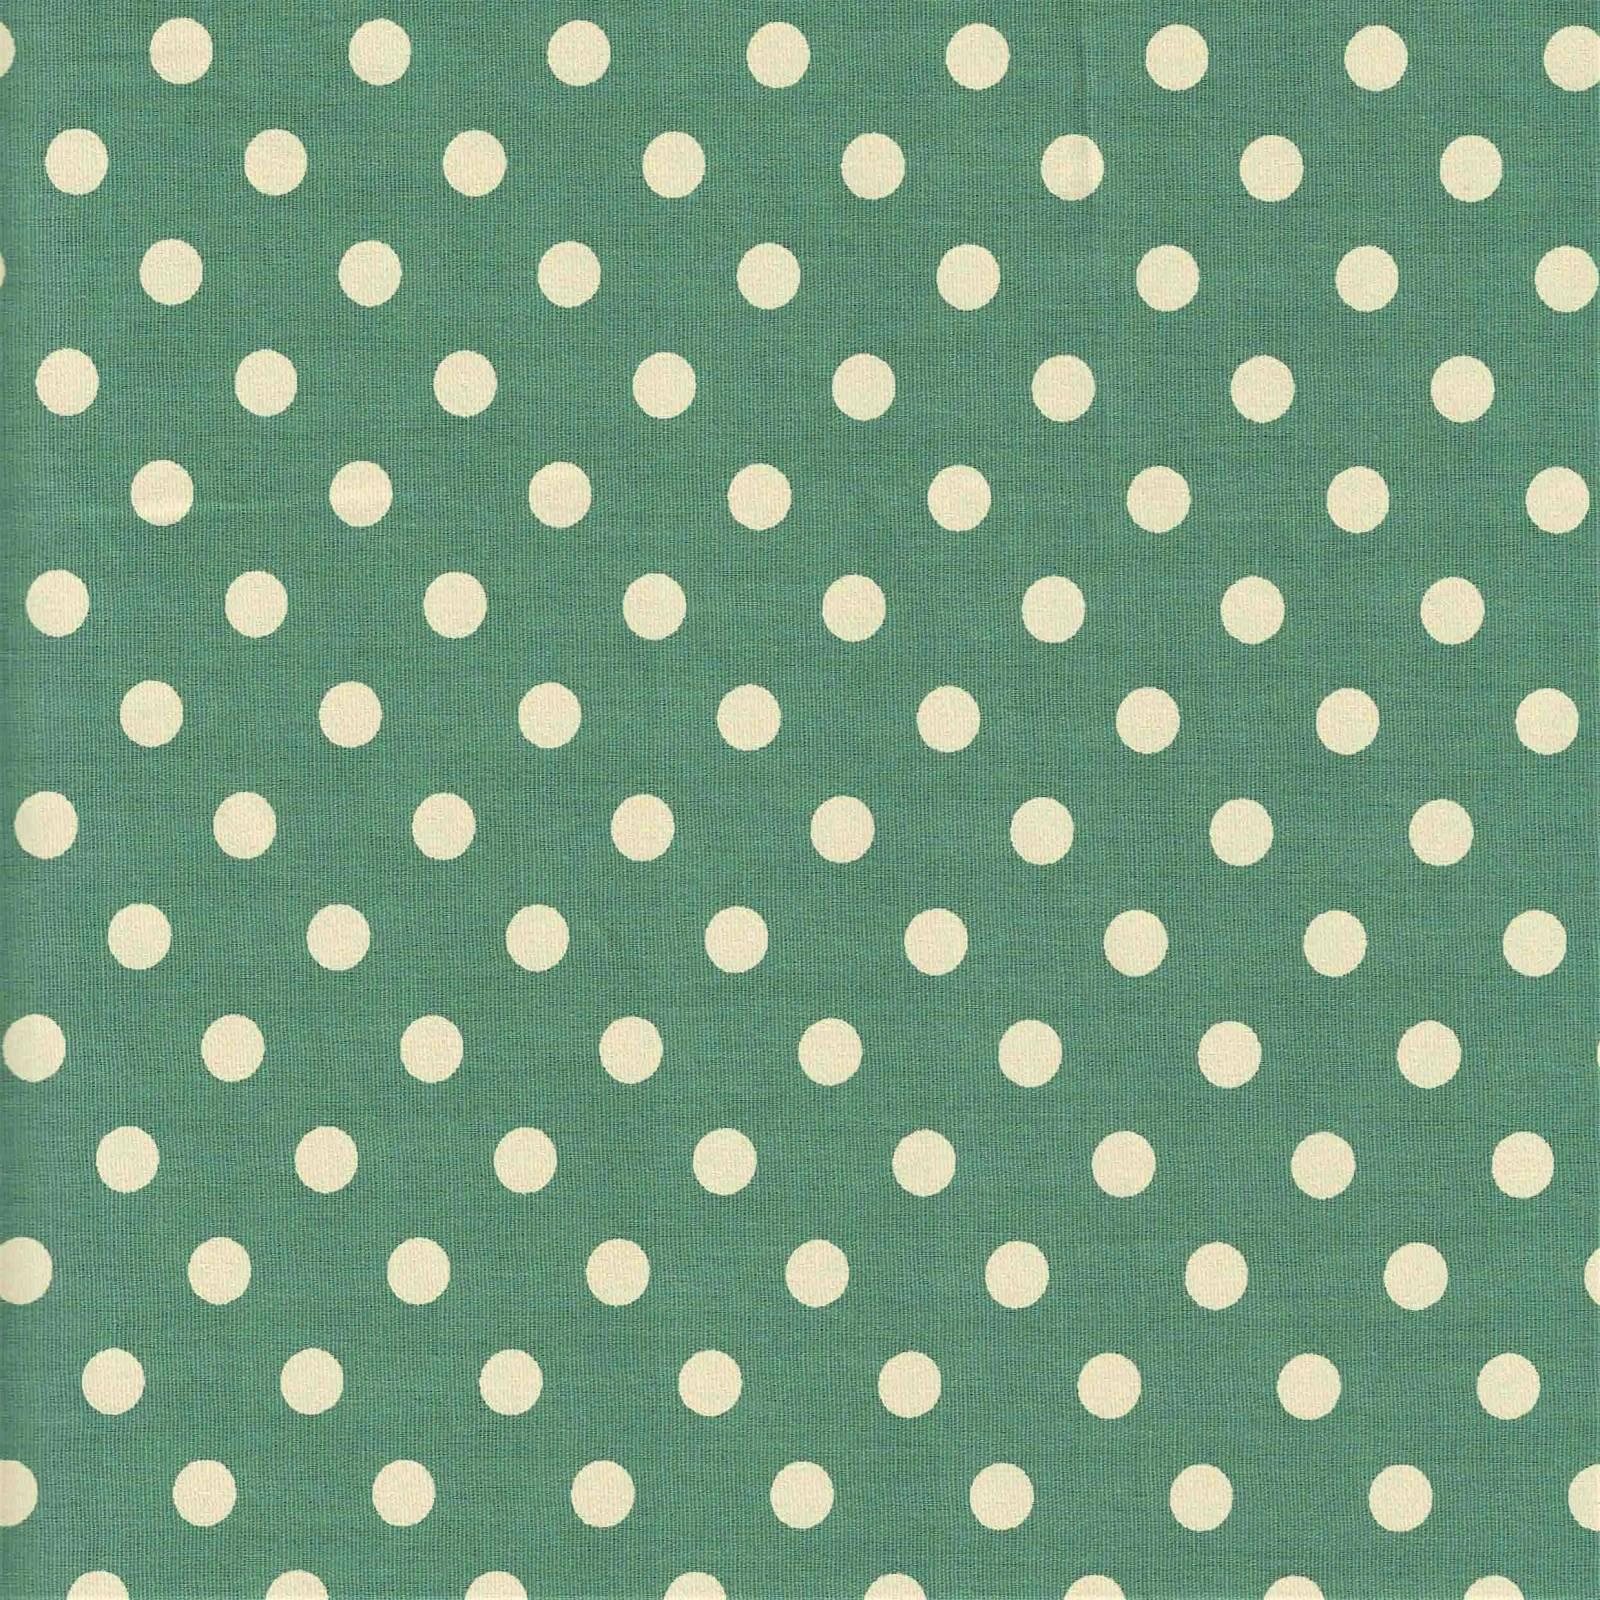 Poá Grande Verde Seco Com Bege Ref.1554 cor 129 Peripan - Armarinhos Nodari